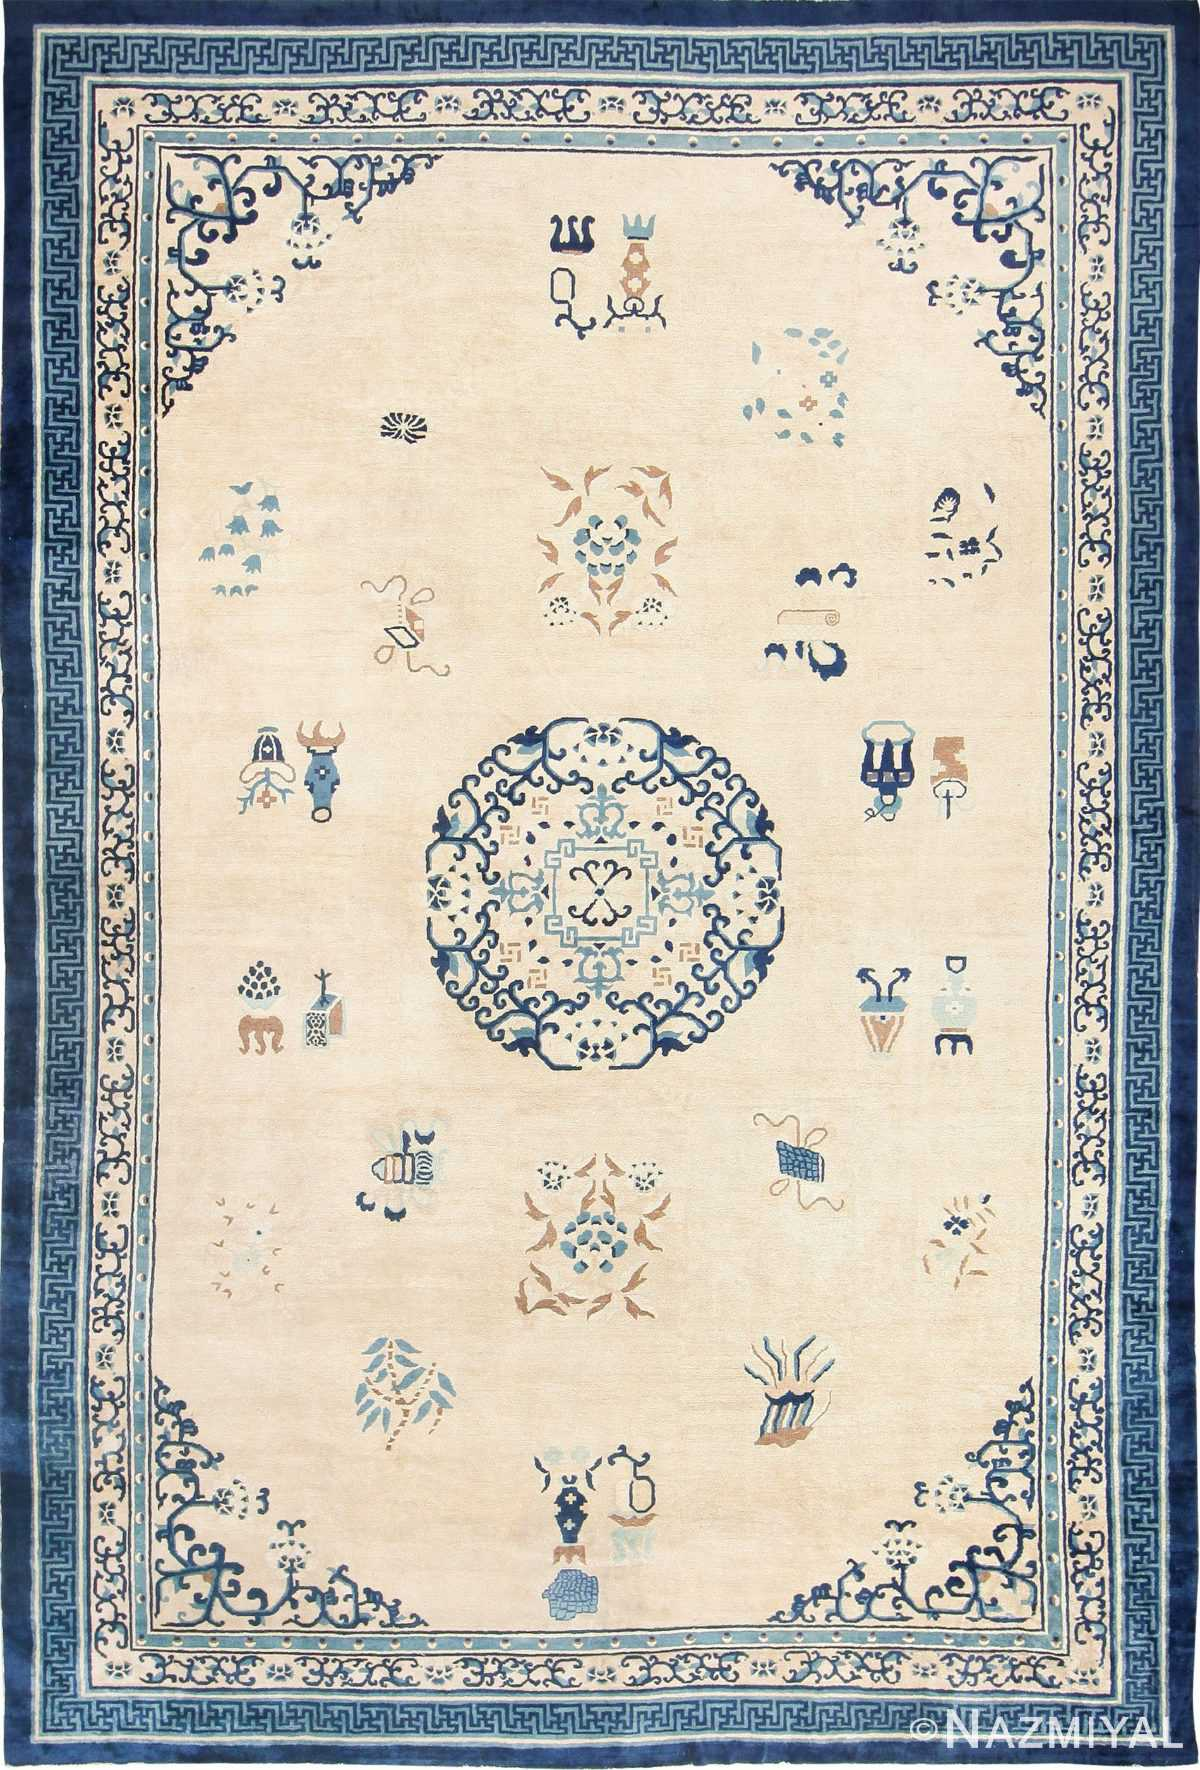 Large Antique Chinese Carpet 43981 Detail/Large View